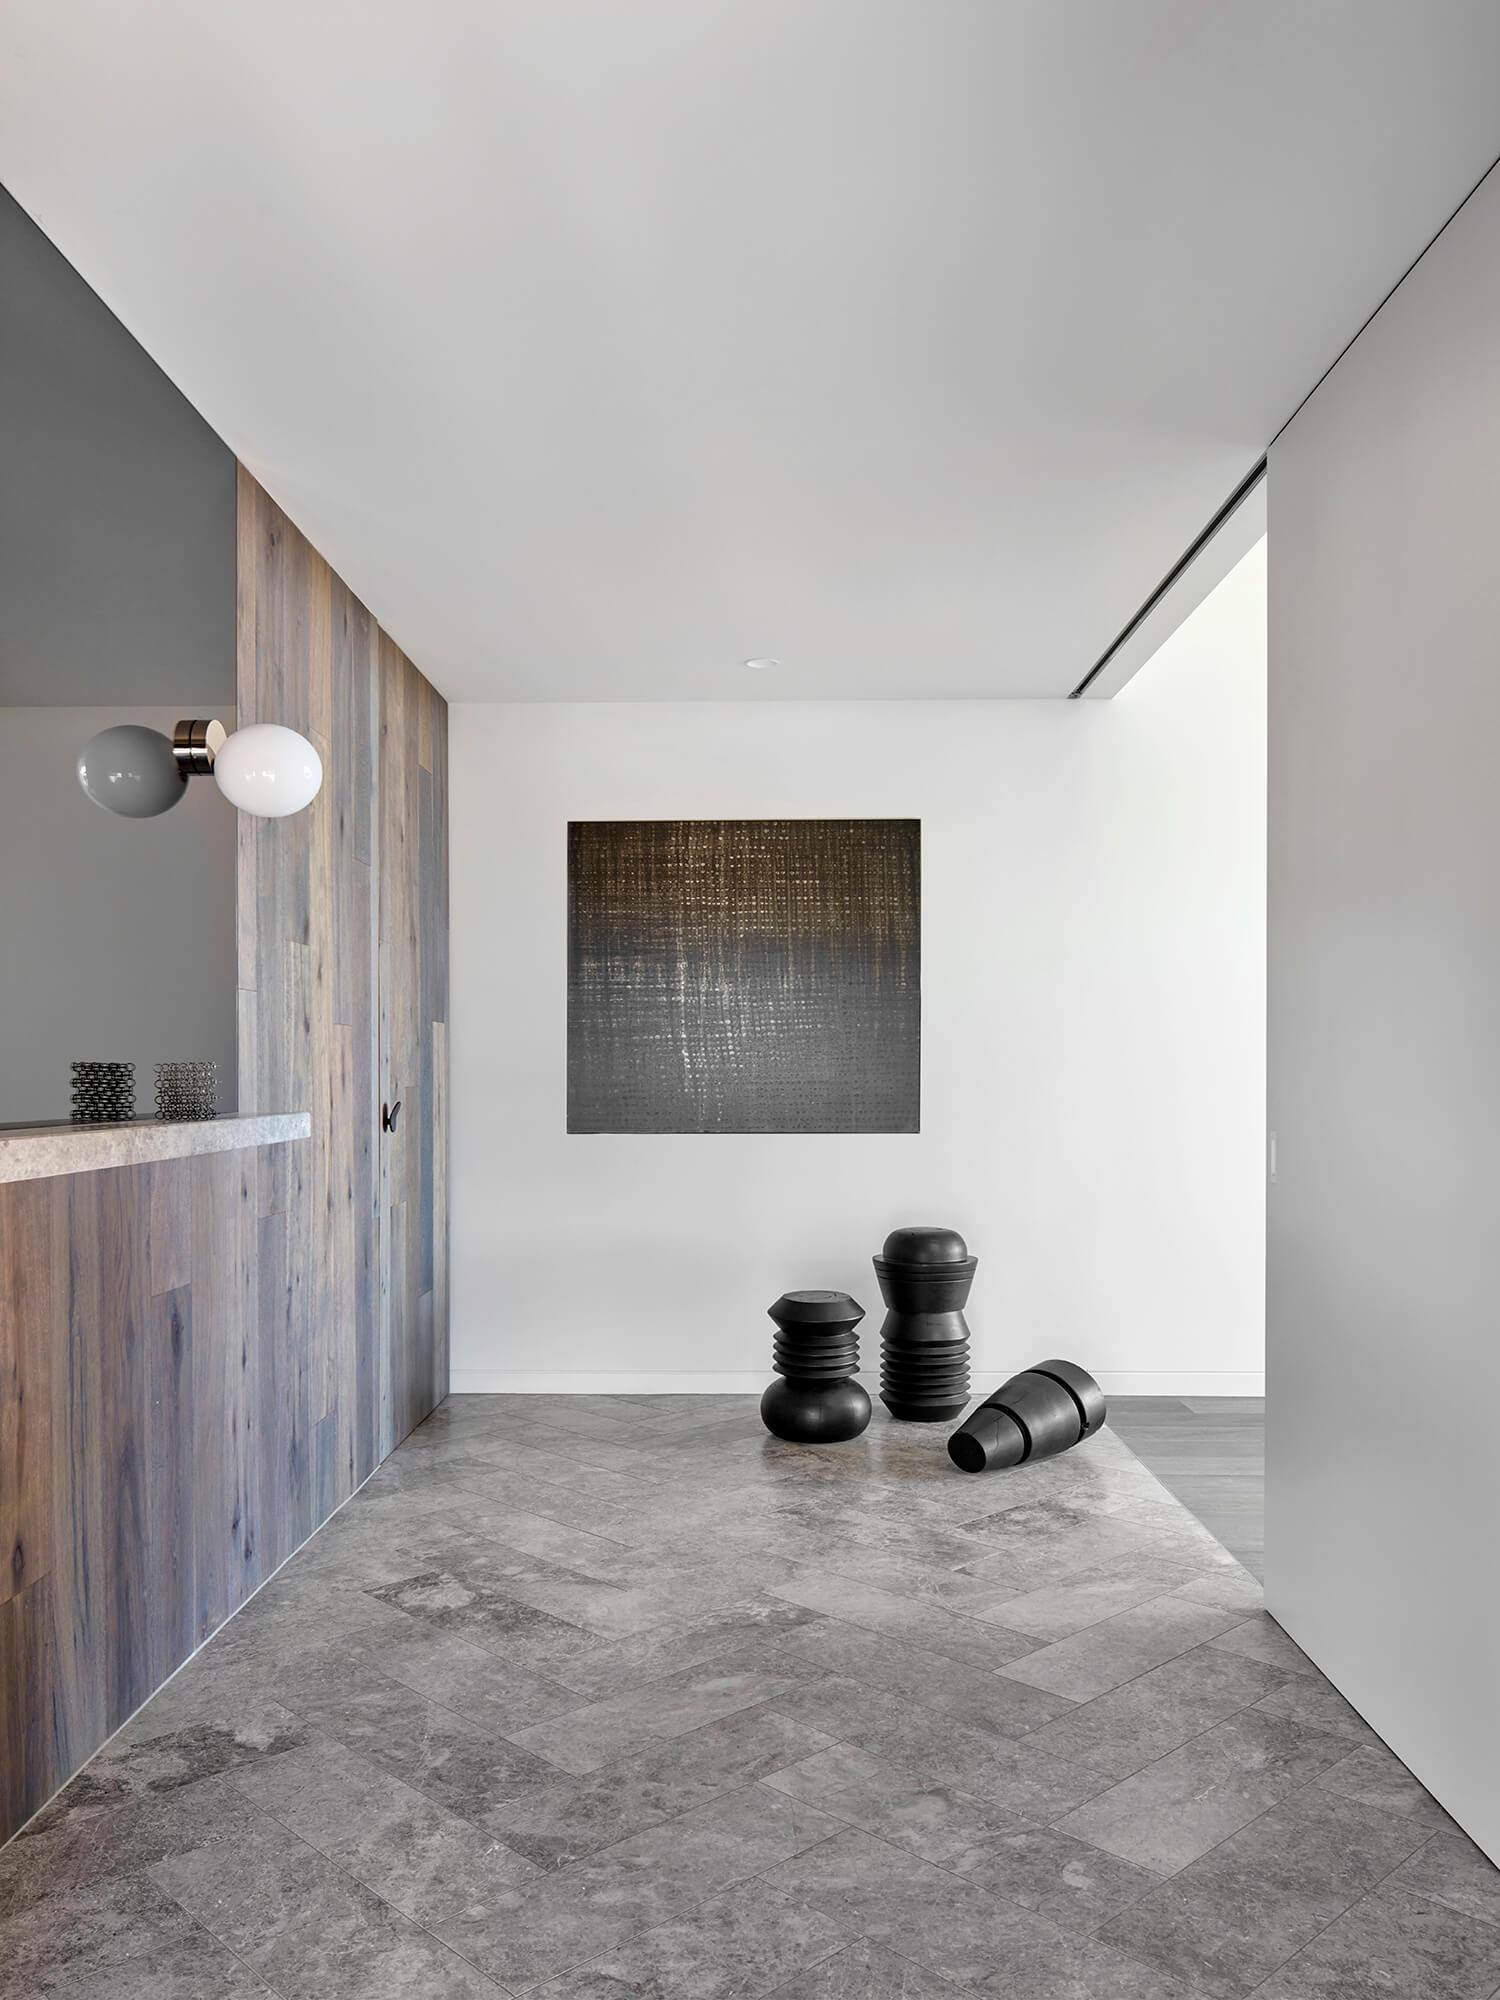 est living interiors Ceres Gable House Tecture 06